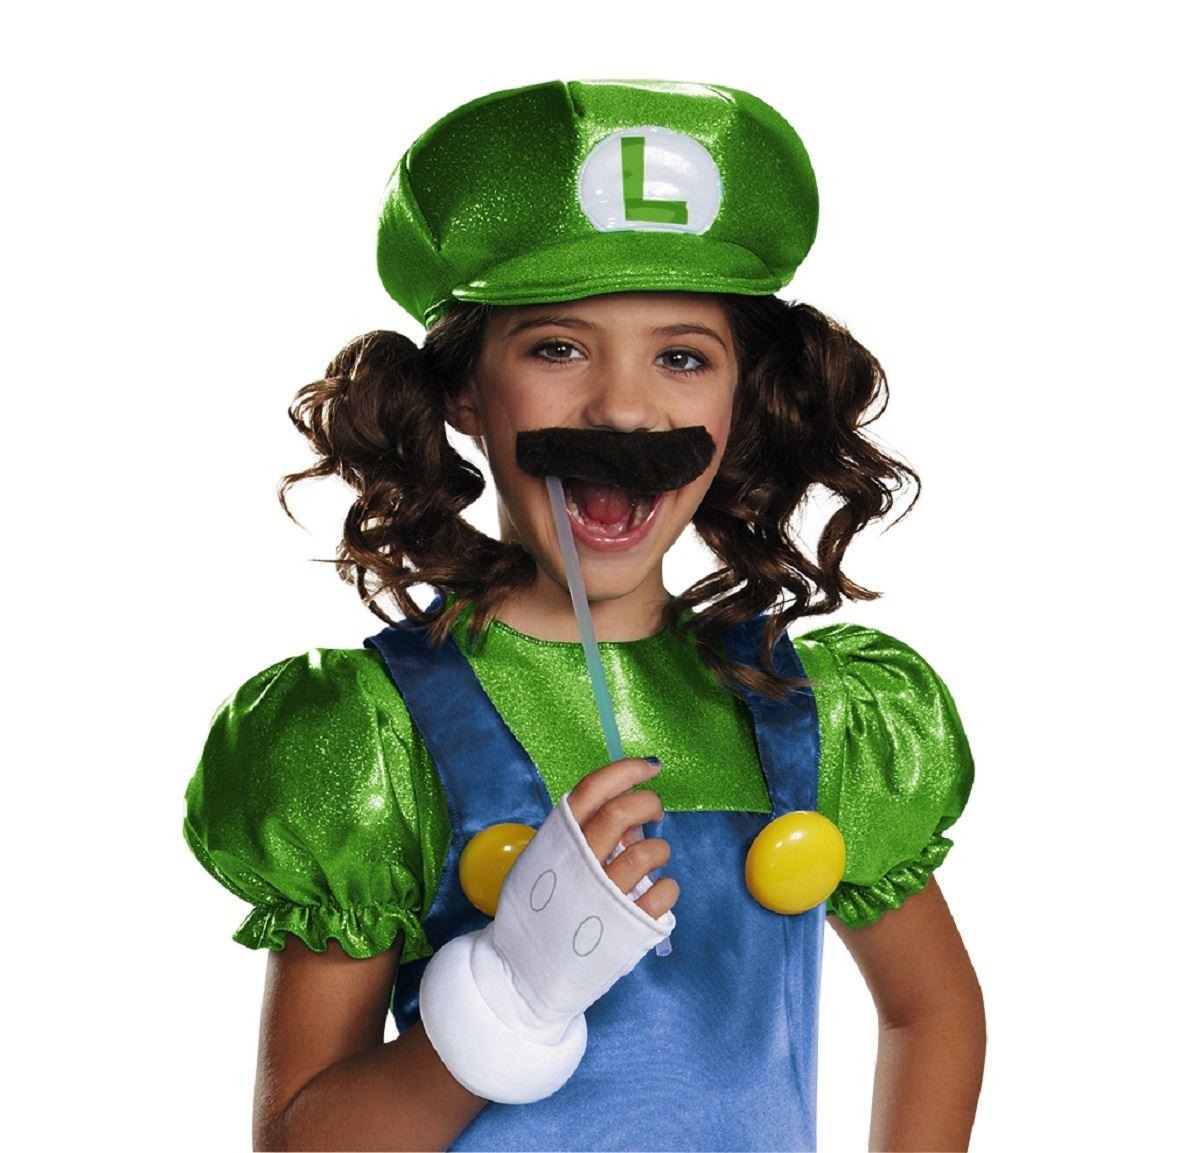 Kids Luigi Girls Super Mario Costume Kids Luigi Girls Super Mario Costume  sc 1 st  The Costume Land & Kids Luigi Girls Super Mario Costume | $34.19 | The Costume Land